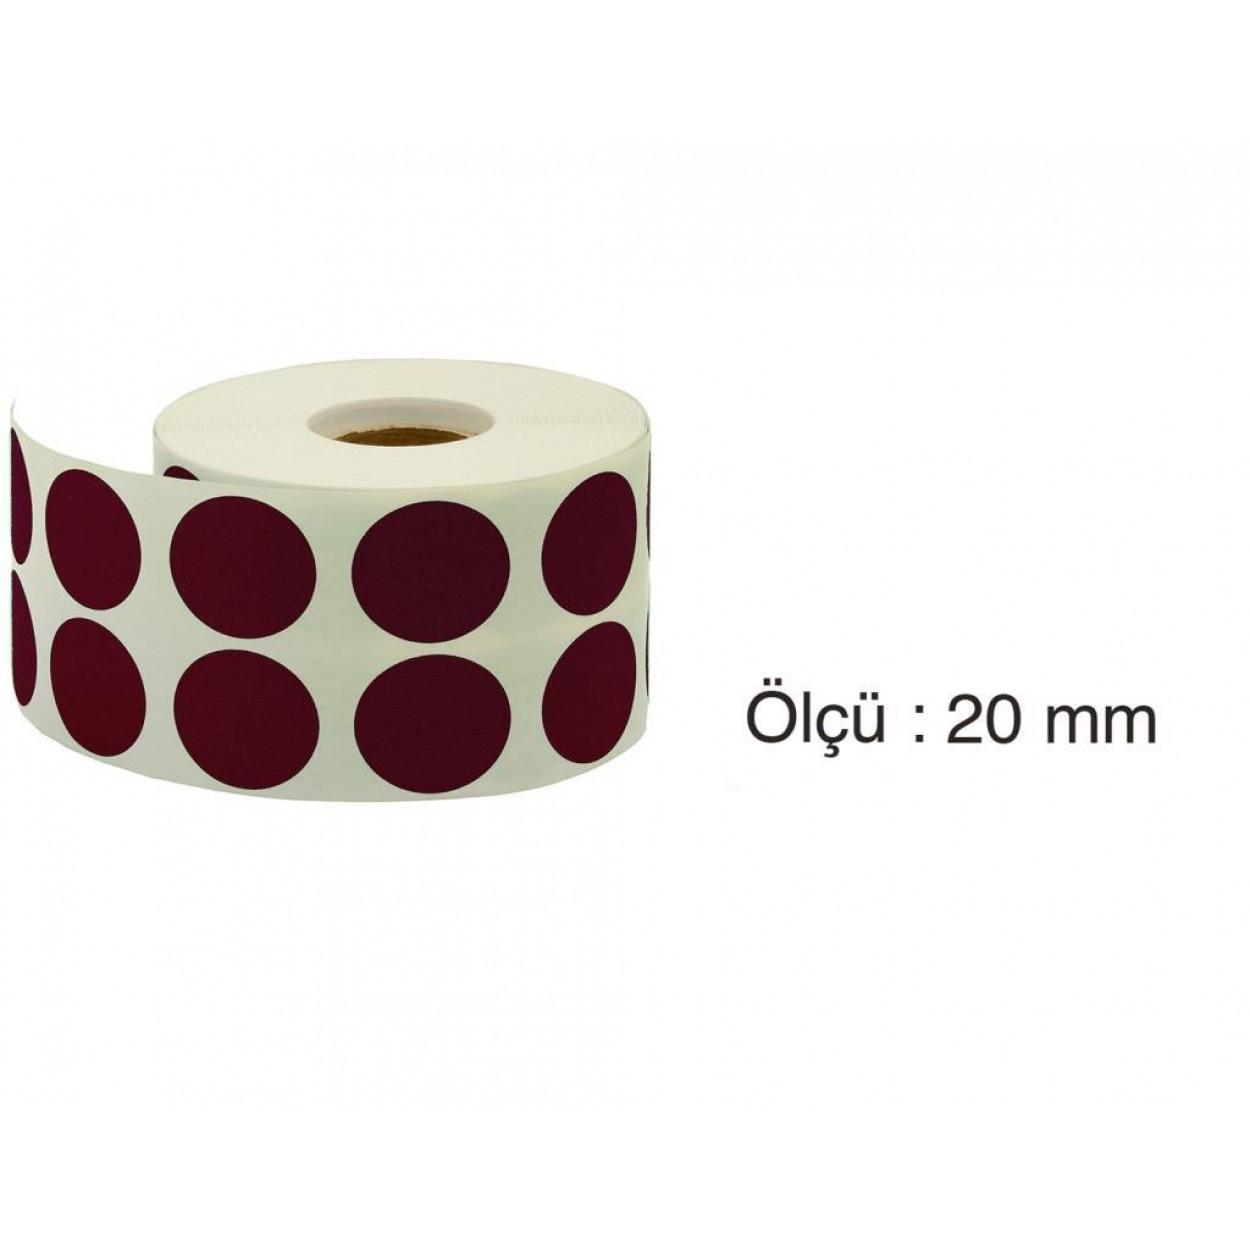 Tanex Nokta Etiket 20 mm 2500 Adet Mor